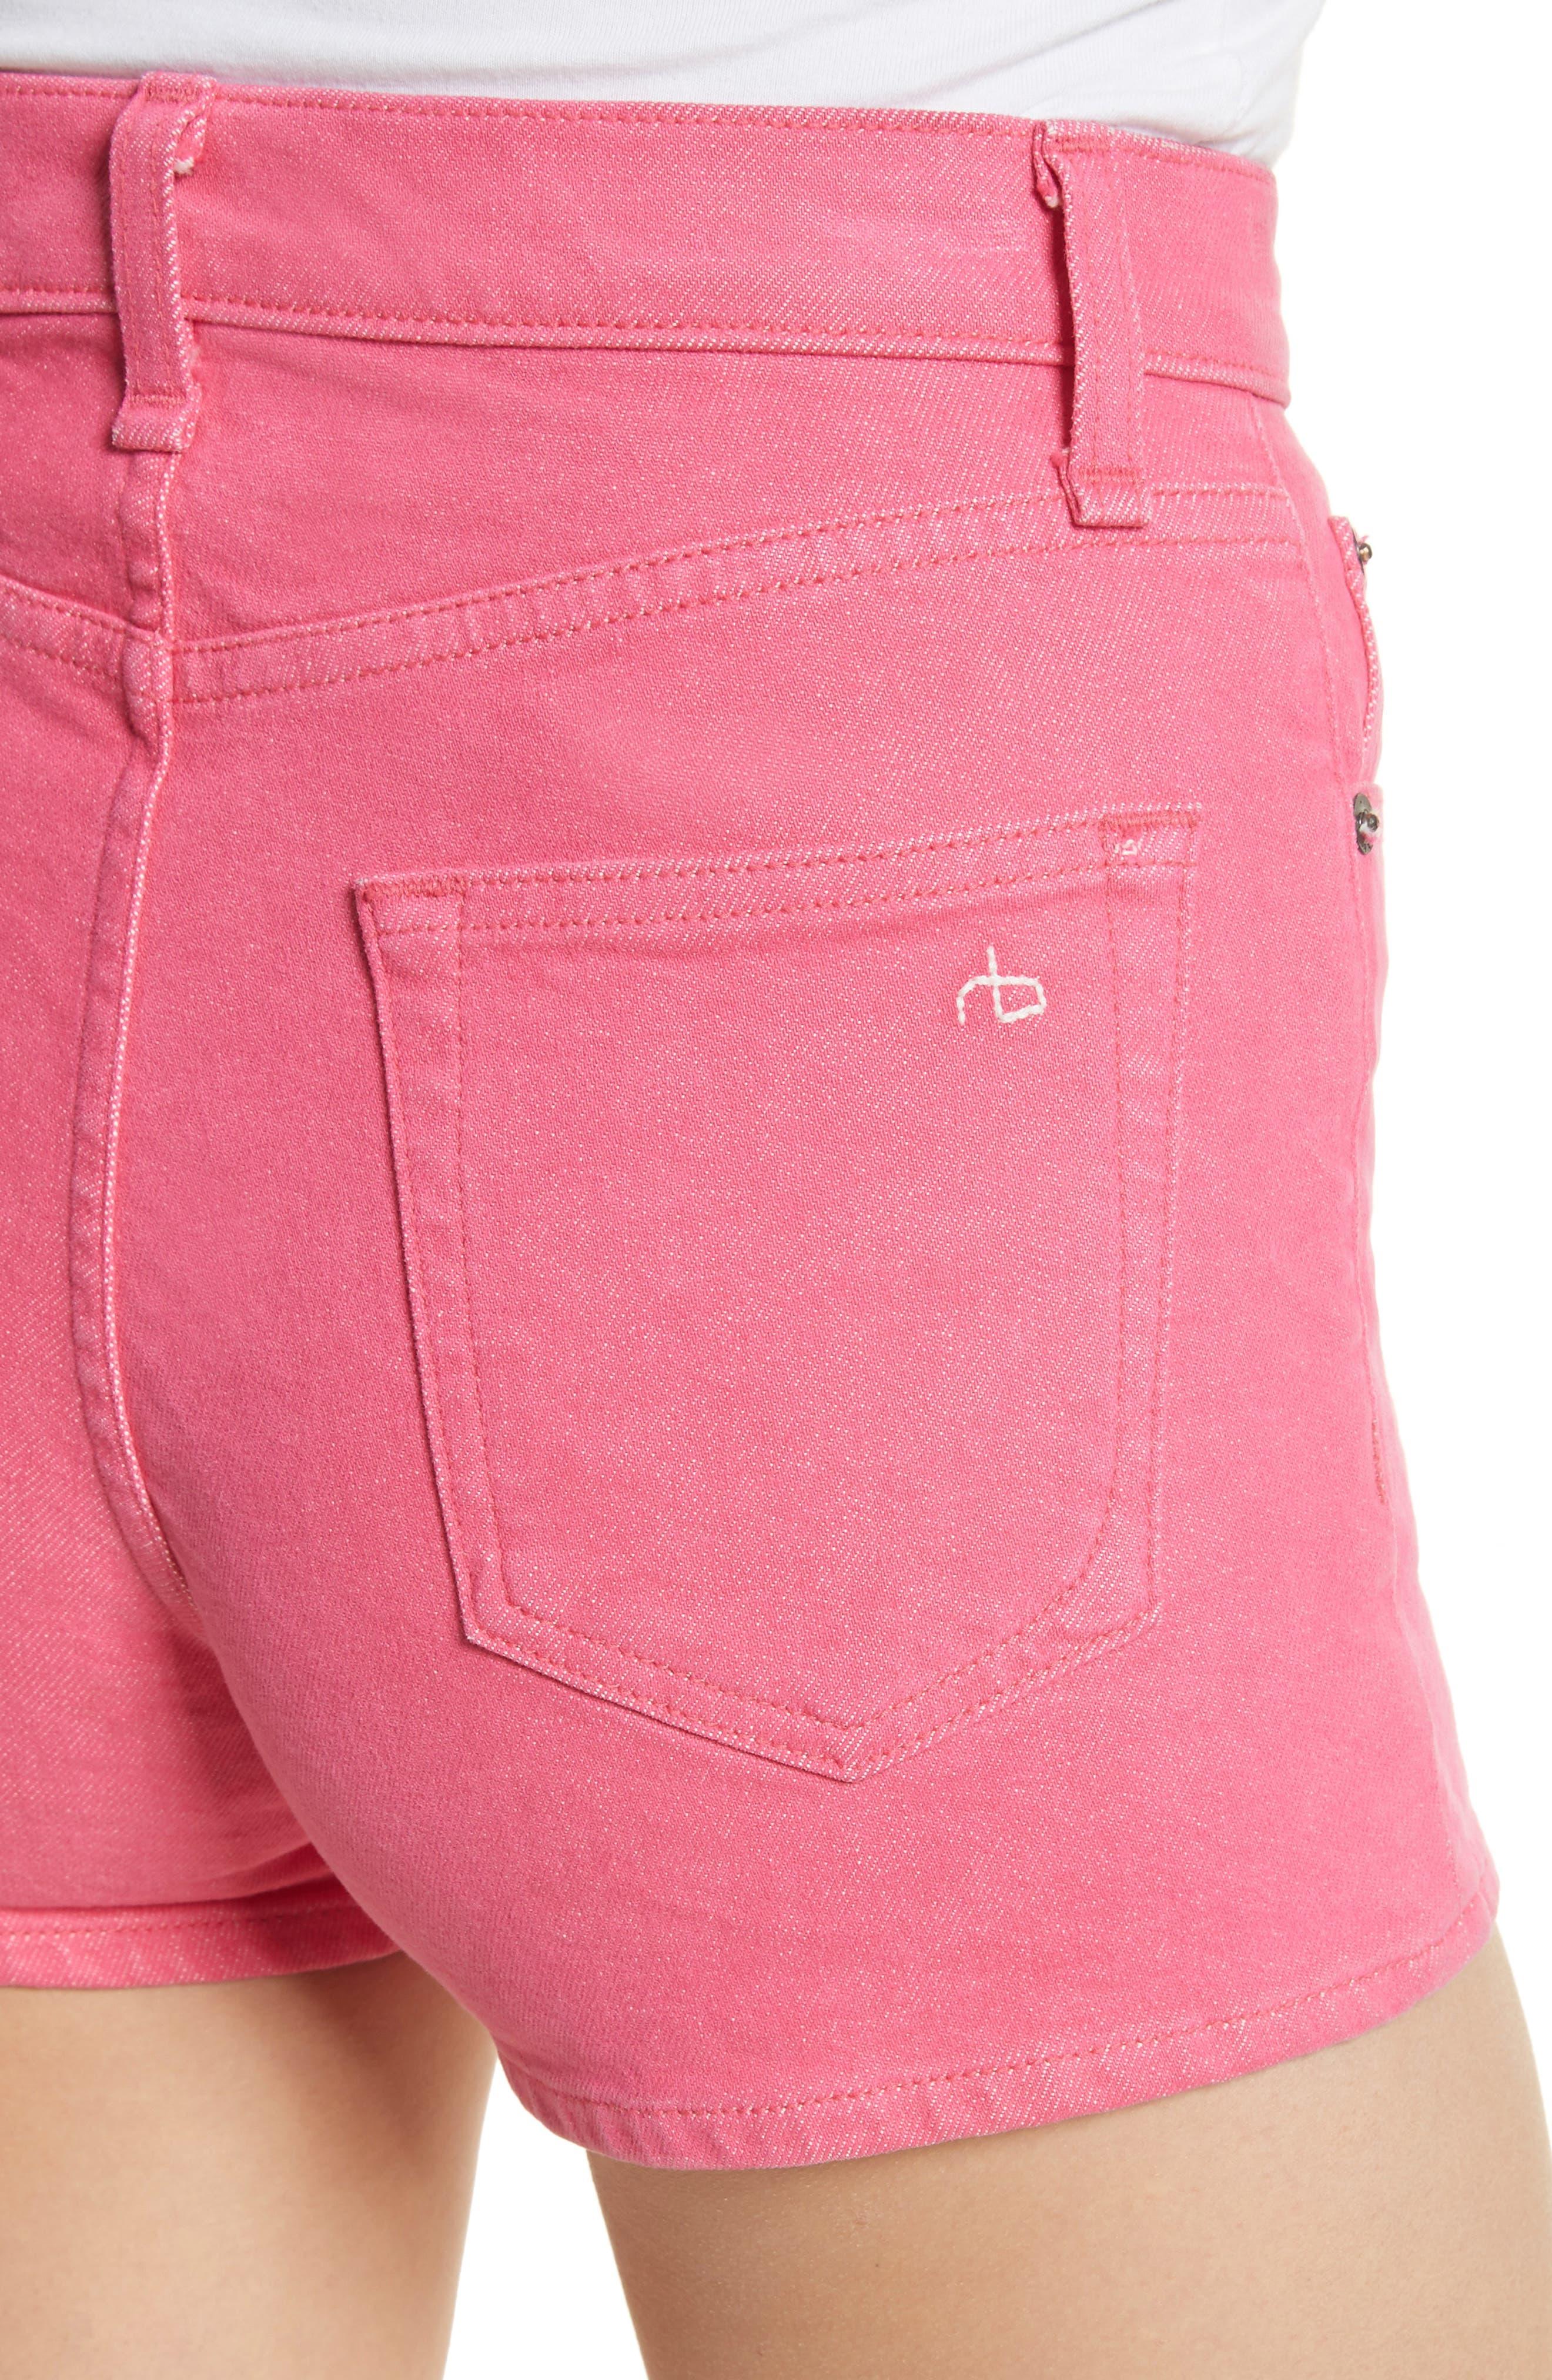 Justine High Waist Denim Shorts,                             Alternate thumbnail 4, color,                             Bull Pink